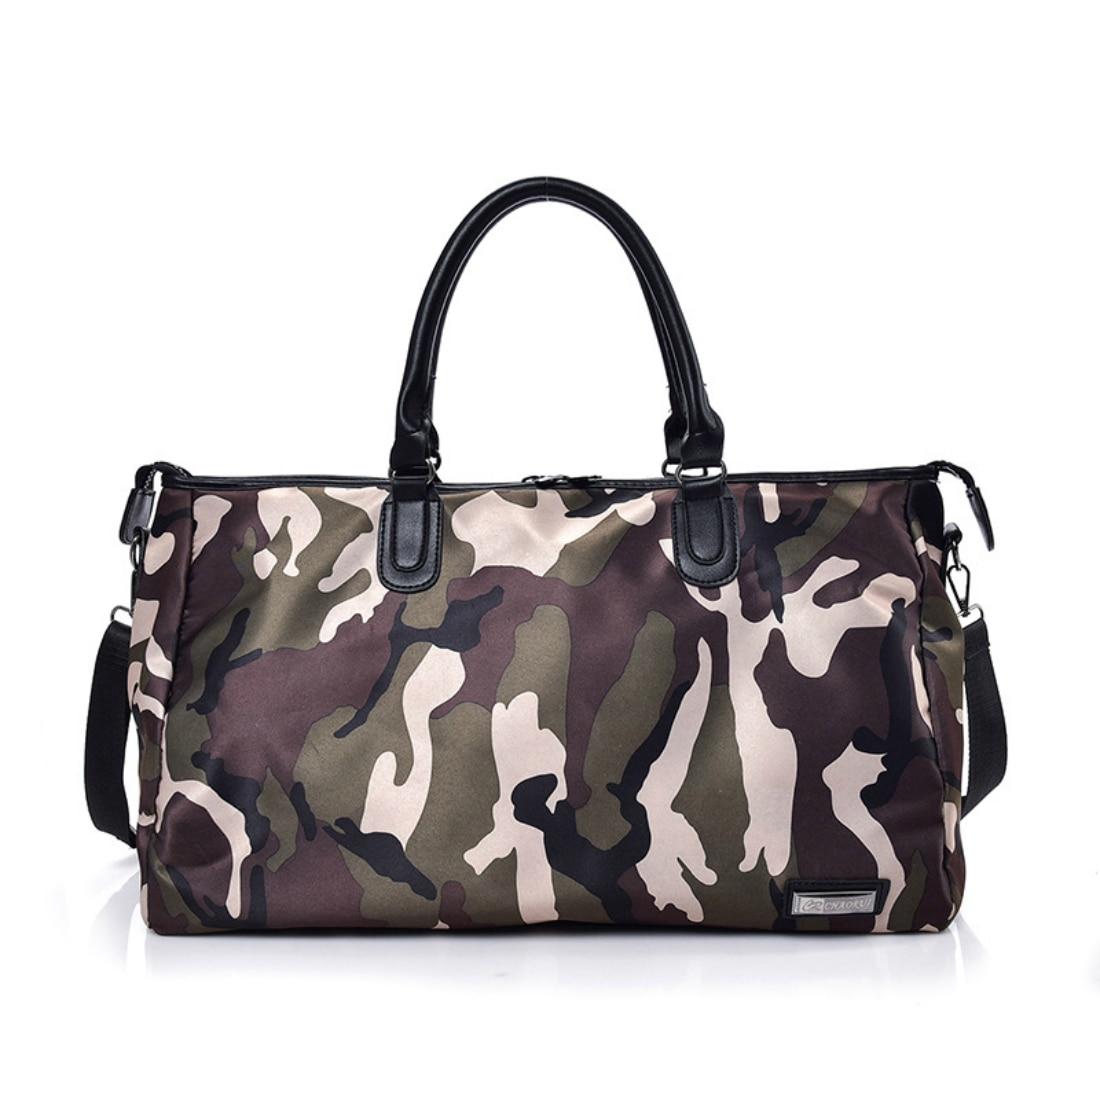 2018 New Camouflage Waterproof Sport Bag Gym Bag Women Men Sport Accessories for Gym Fitness Running Shoulder Bag